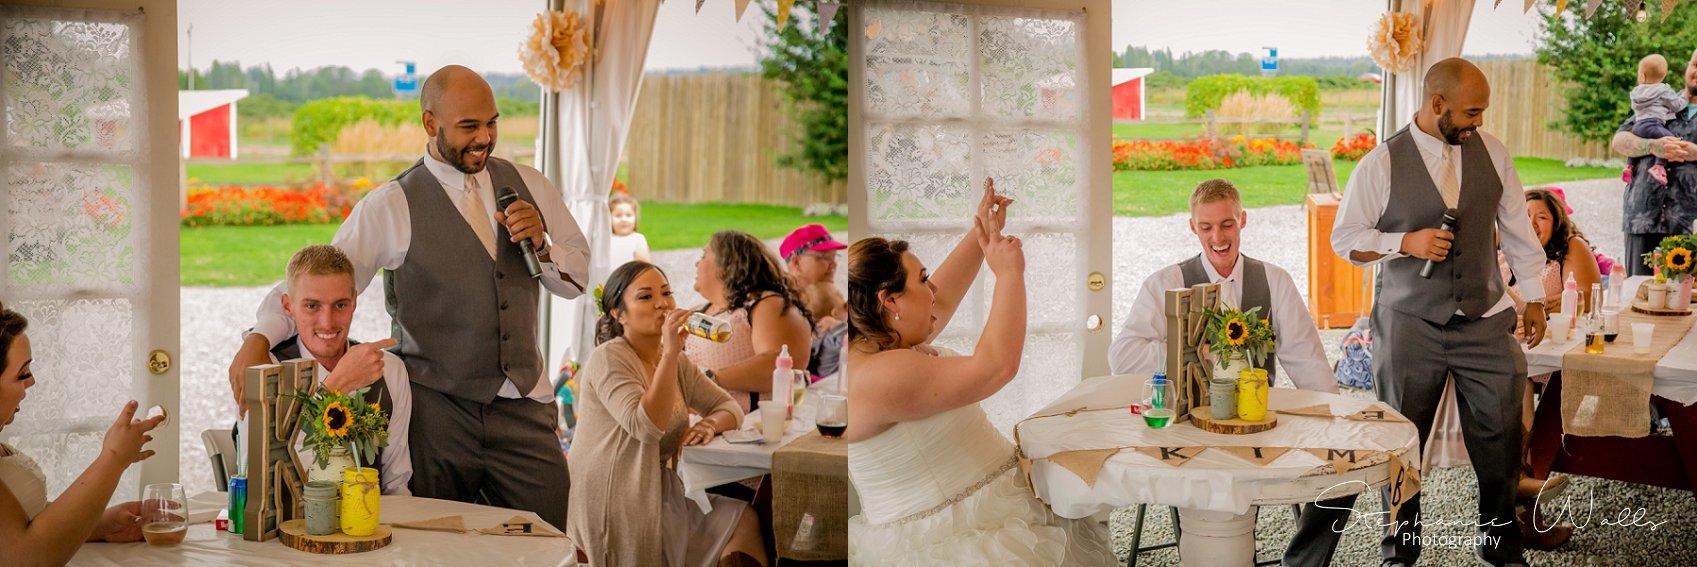 Kimble Wedding 015 Marlena & Allans | Snohomish Red Barn Events (Stocker Farms) | Snohomish, Wa Wedding Photographer